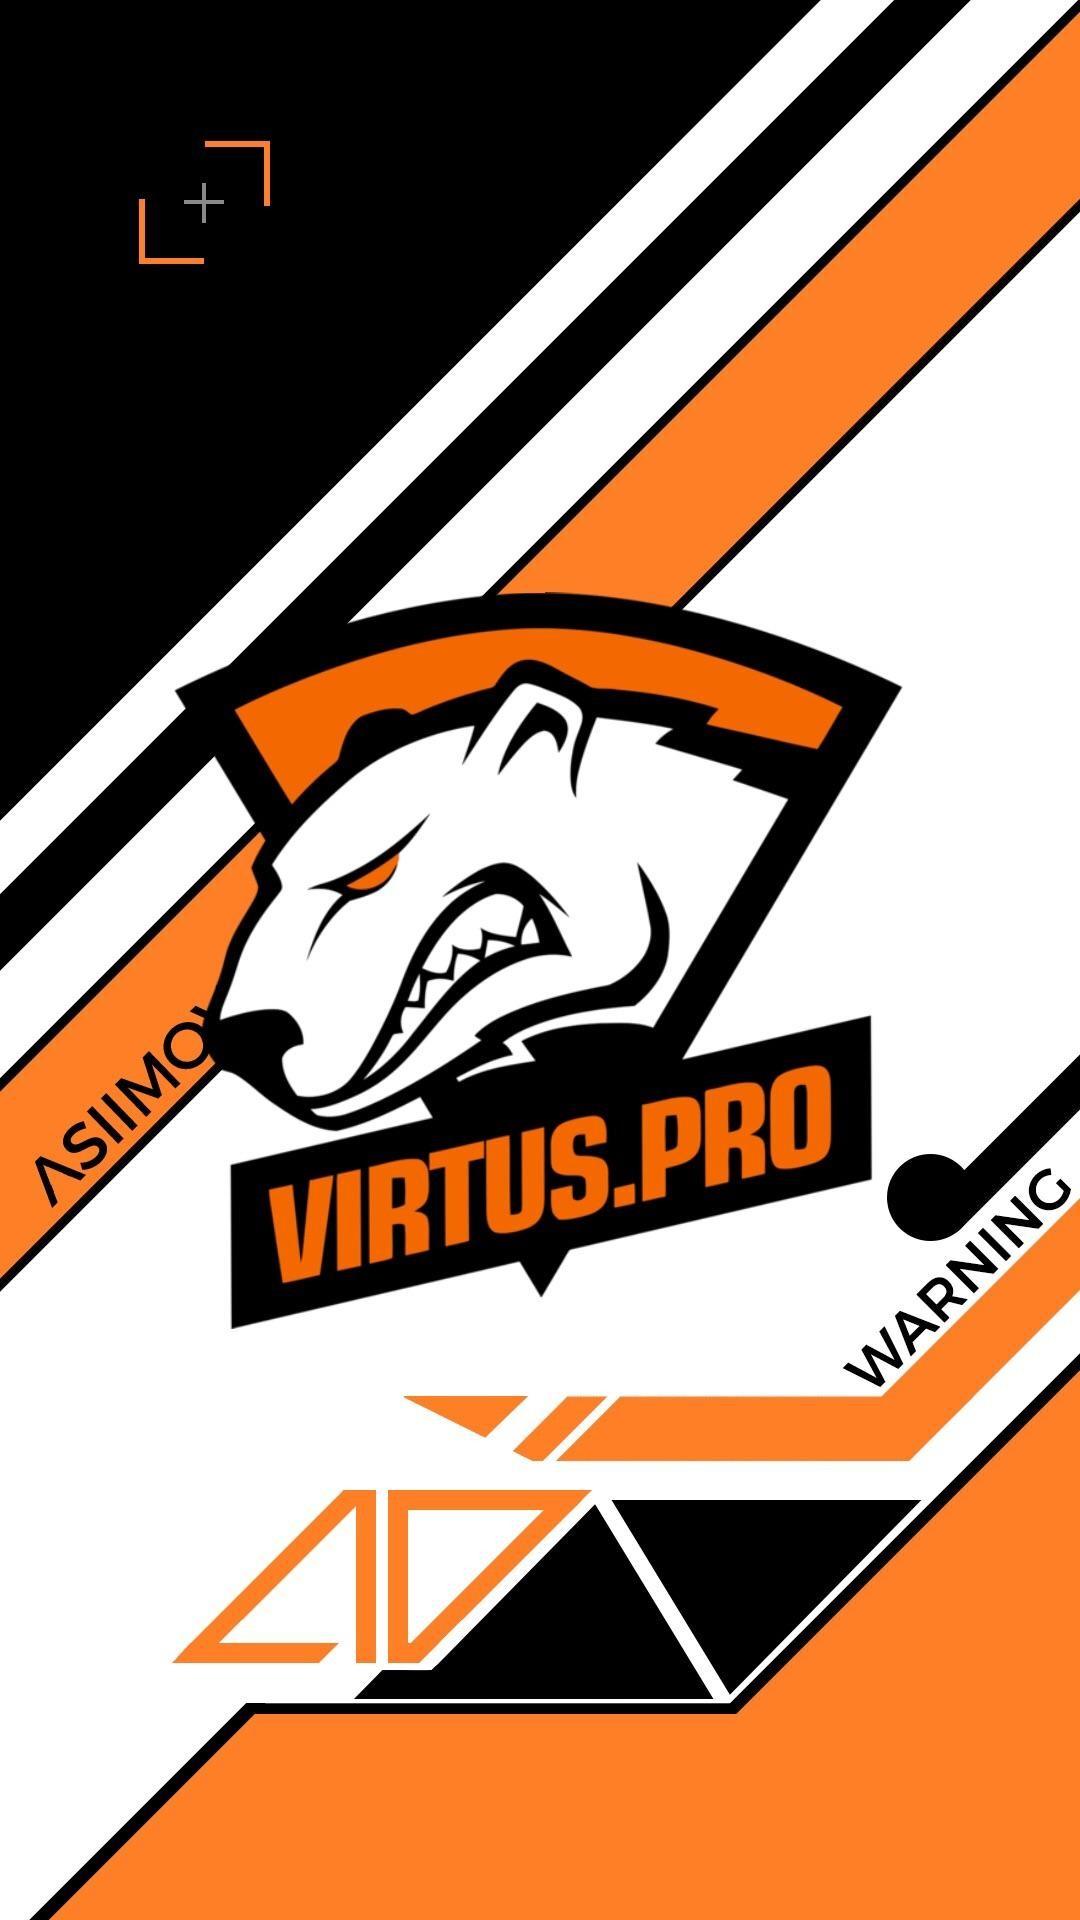 So I made this asiimov/Virtus.Pro Iphone background